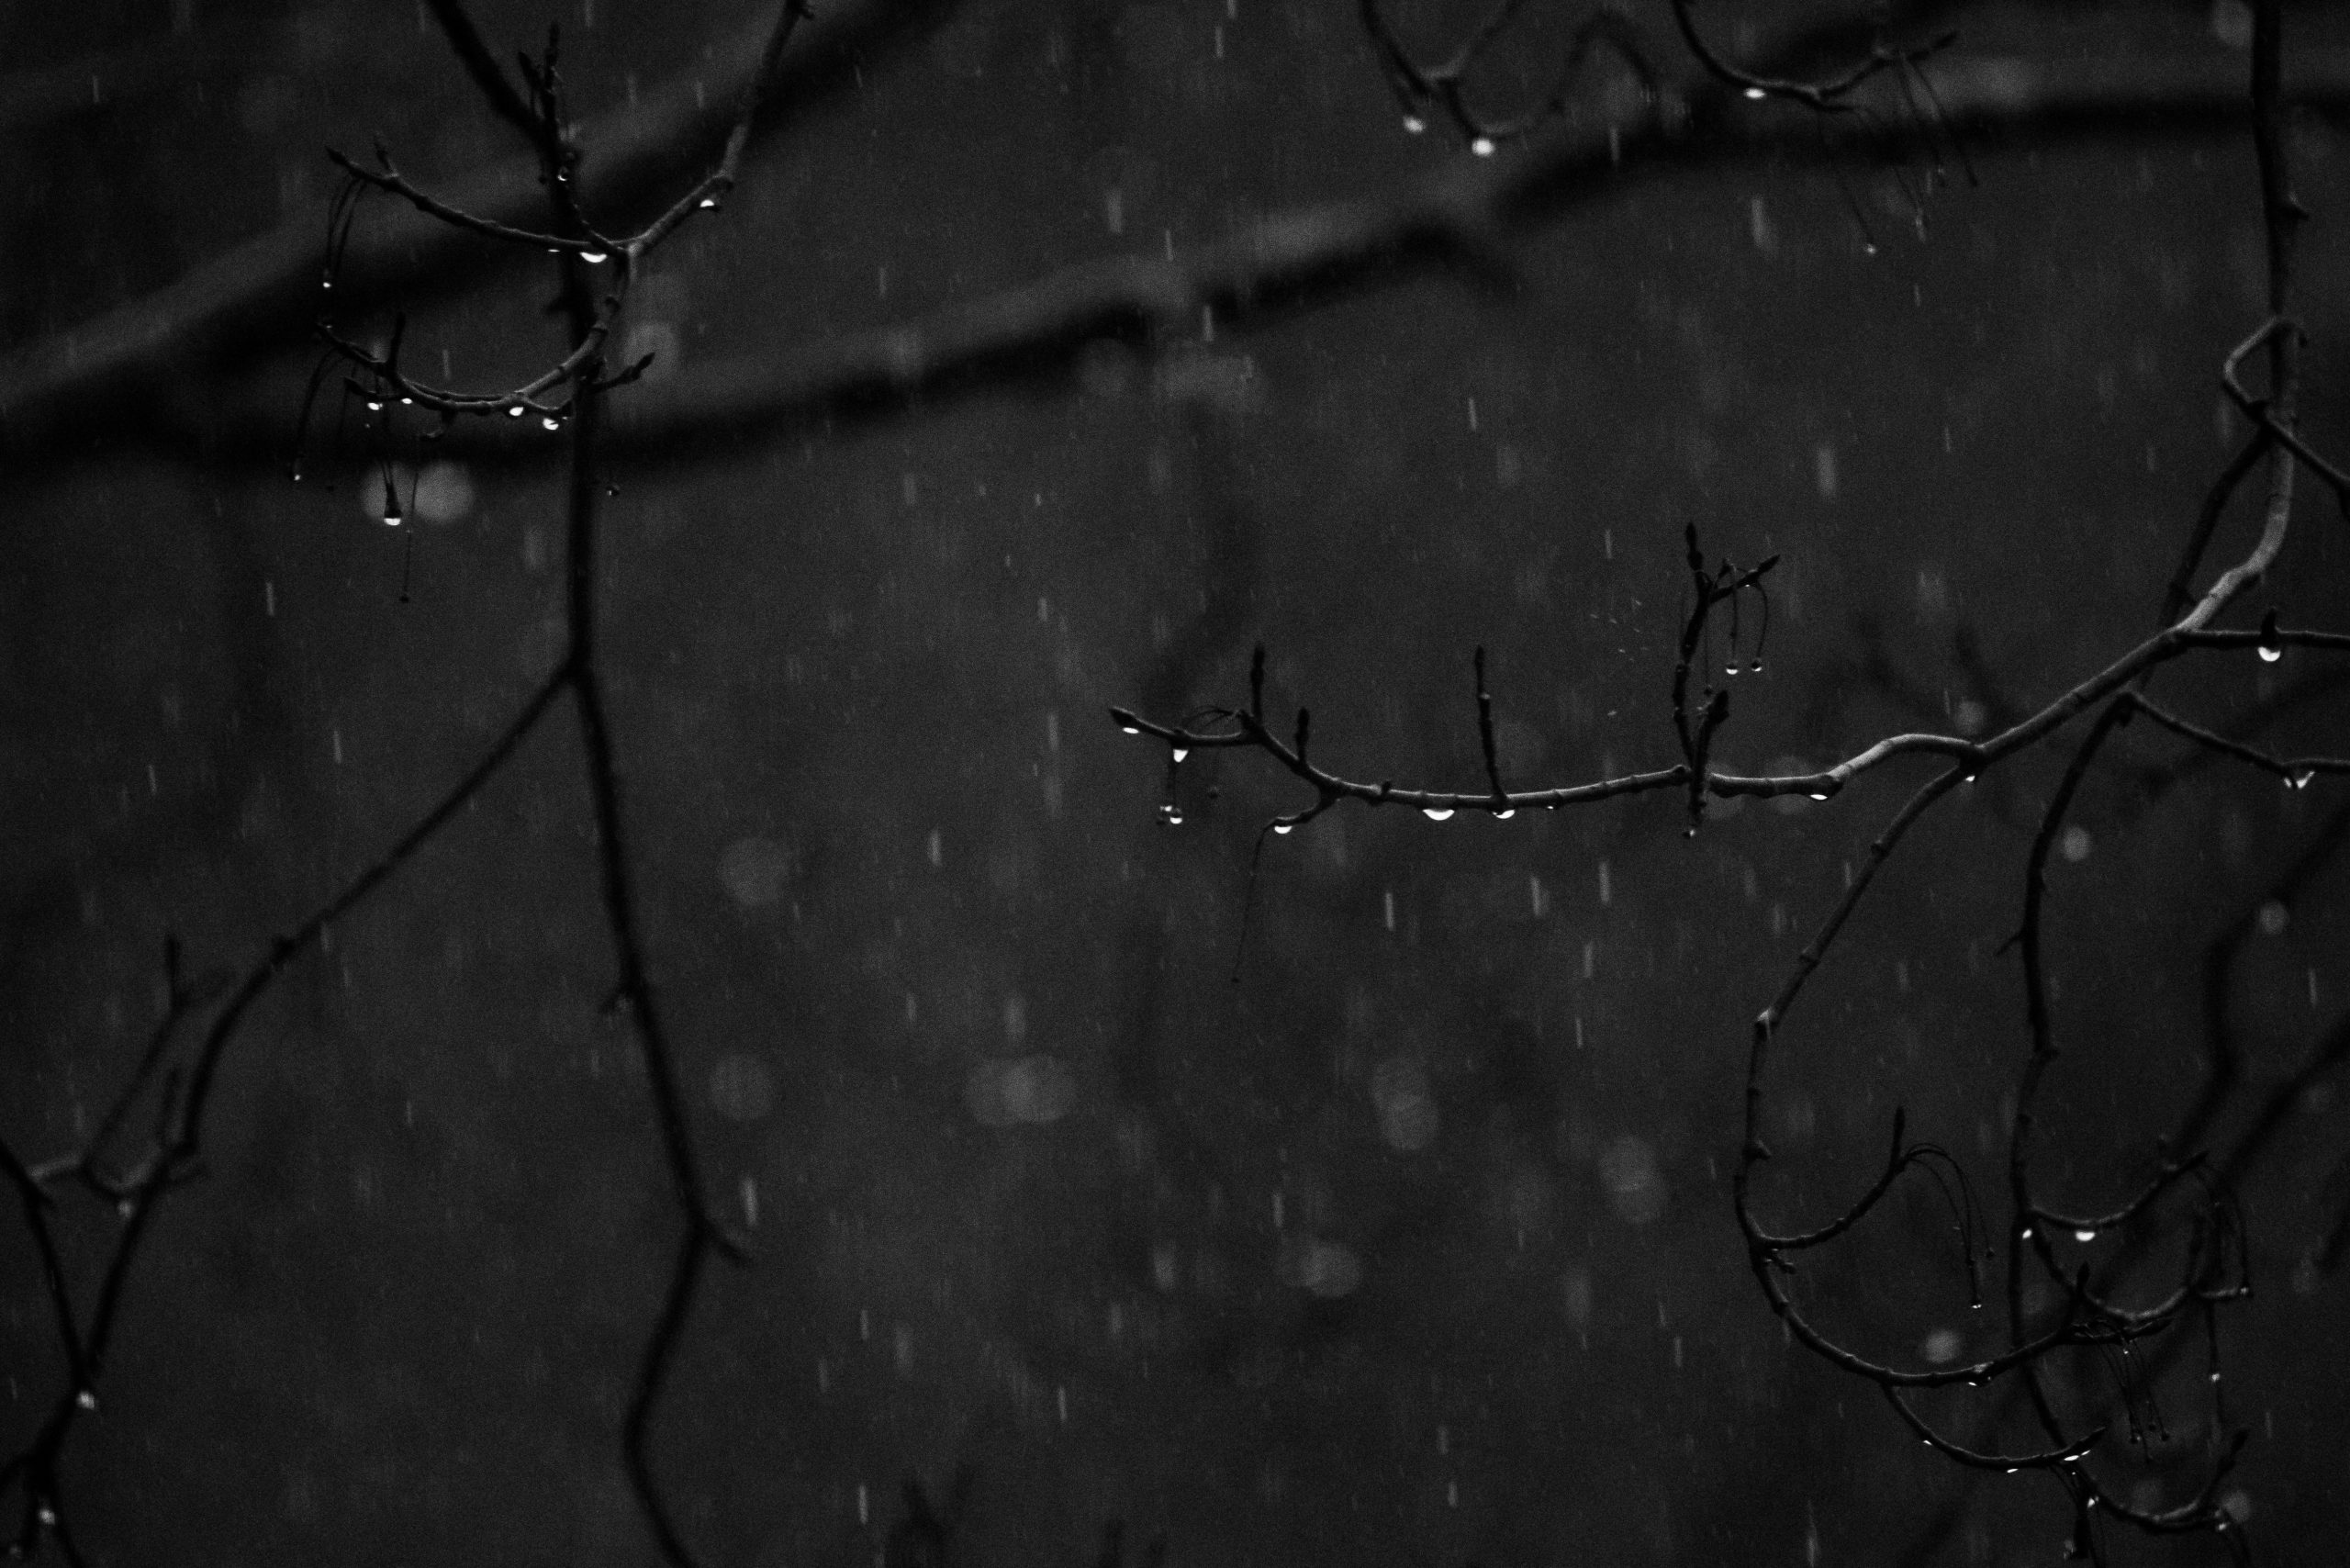 Rain falls on tree branches.